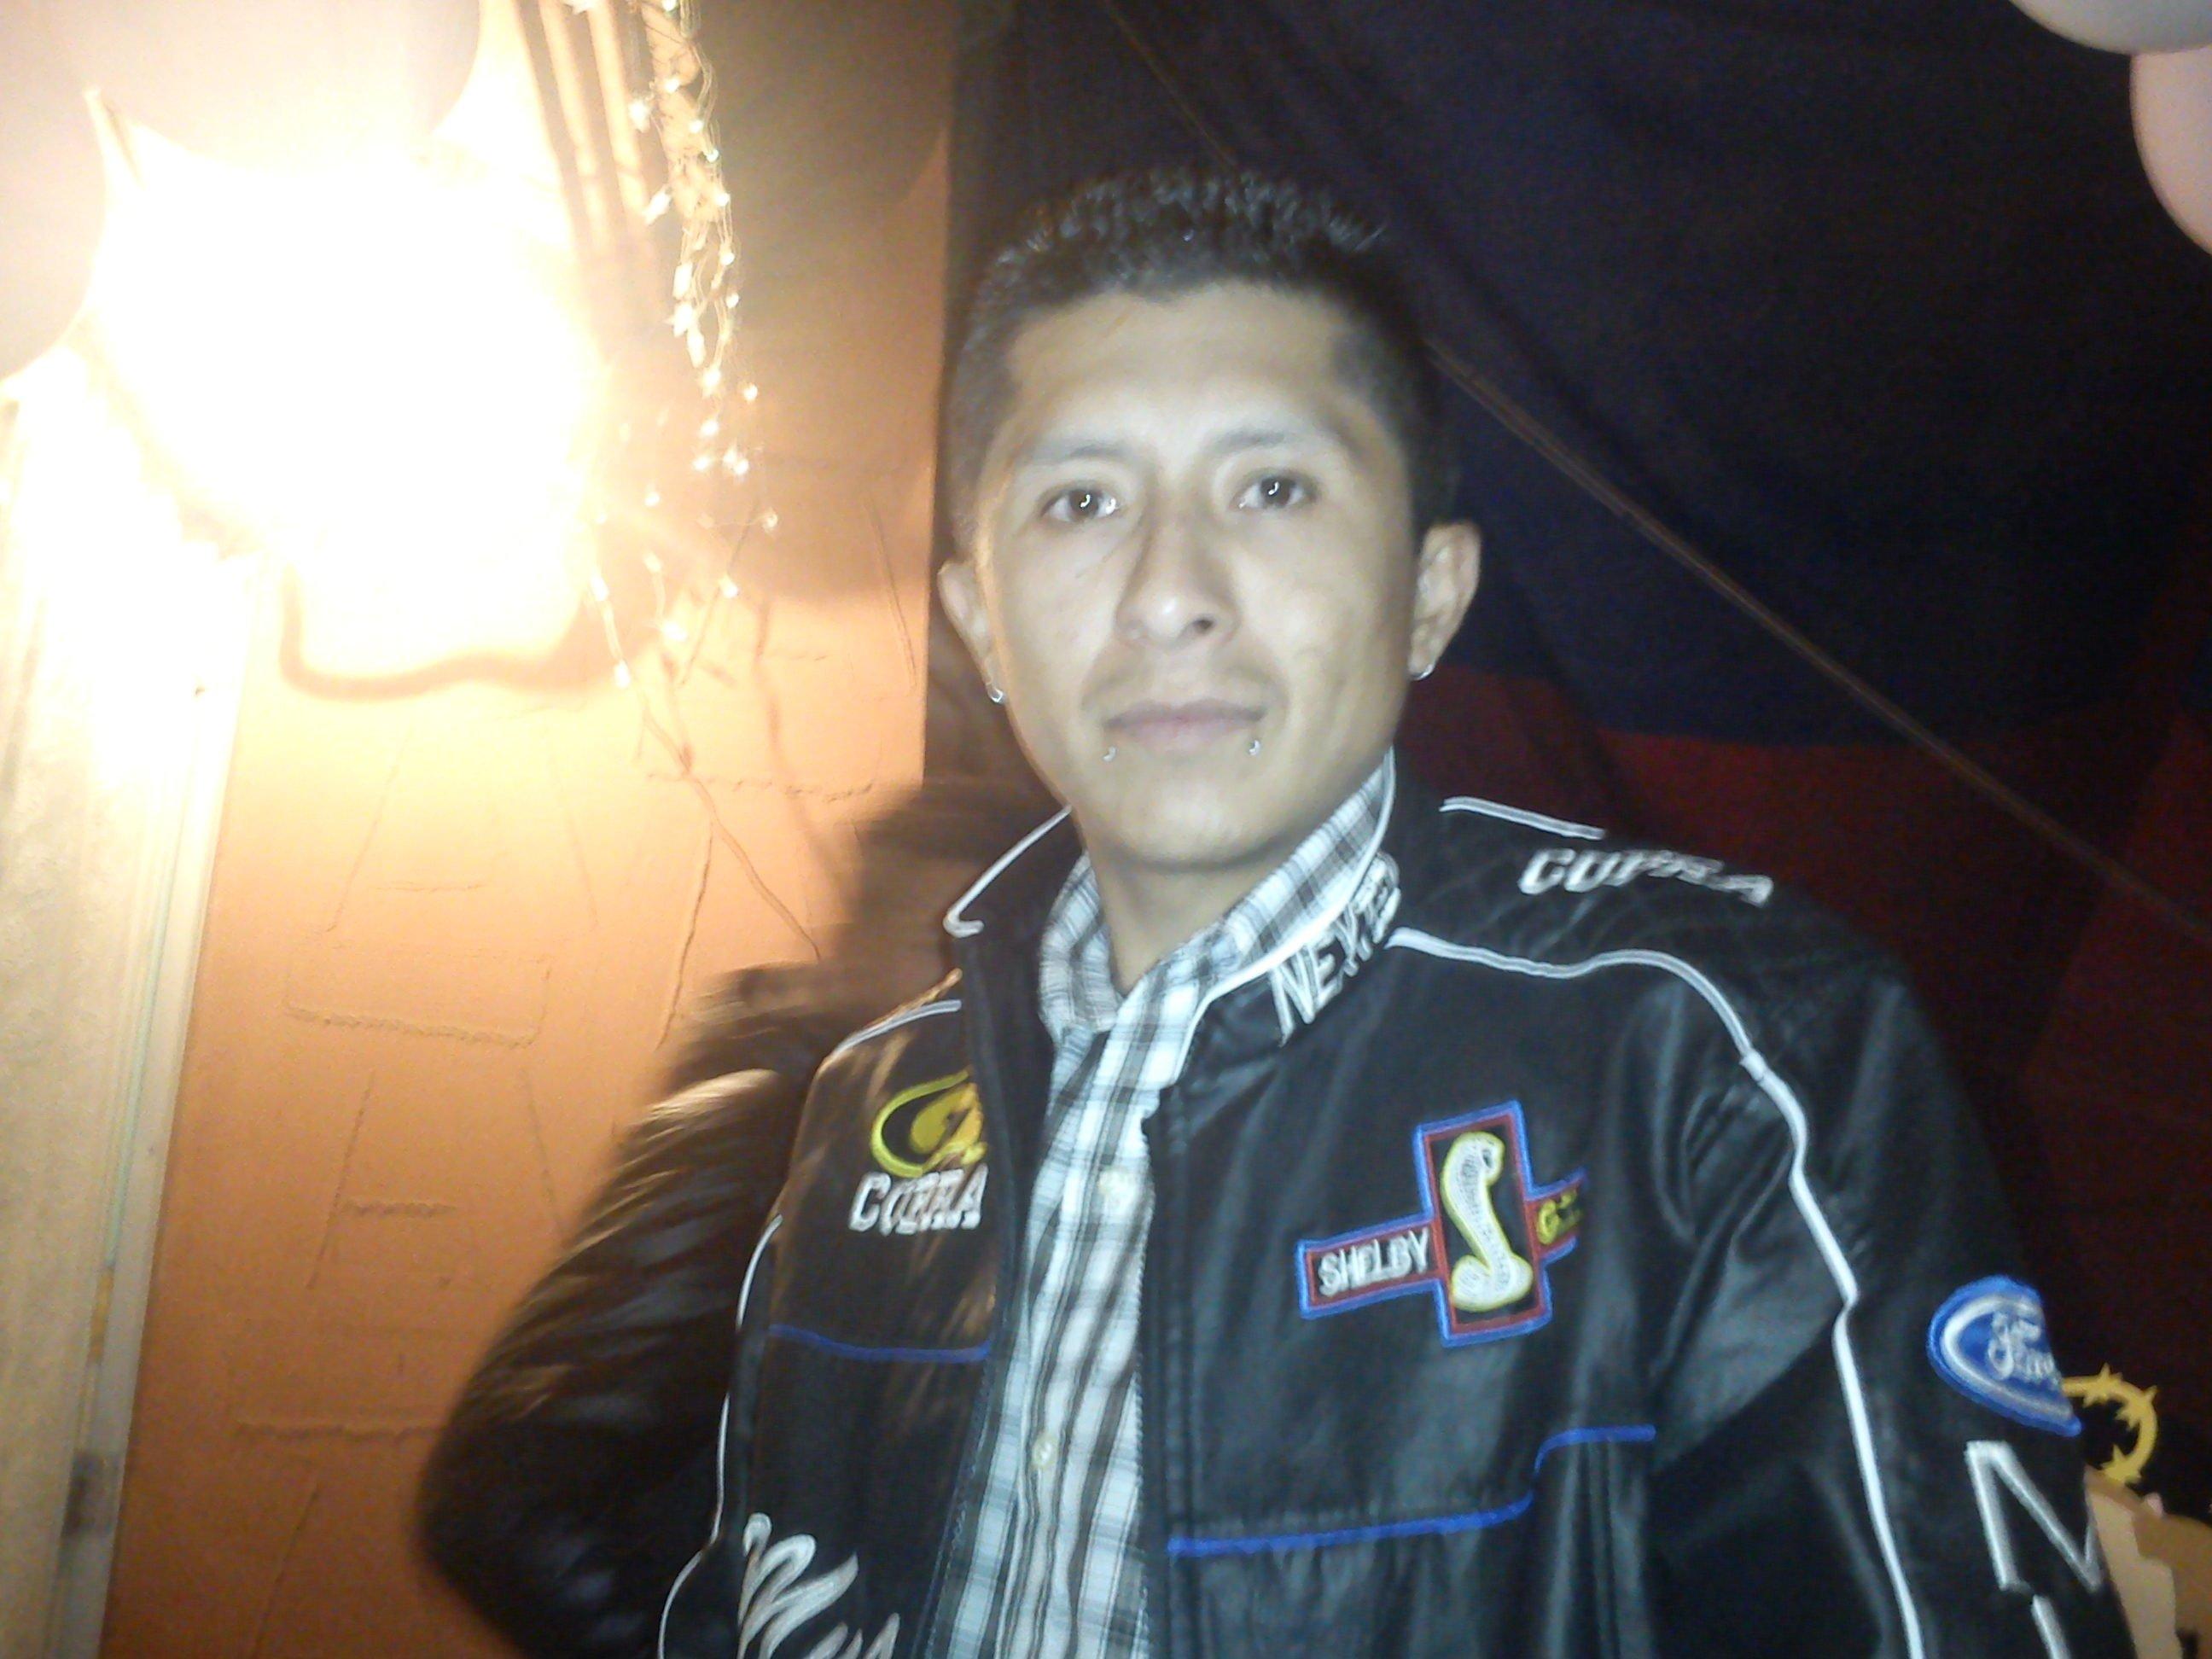 Oscar.perez@mobileco (@oscarperezm29)